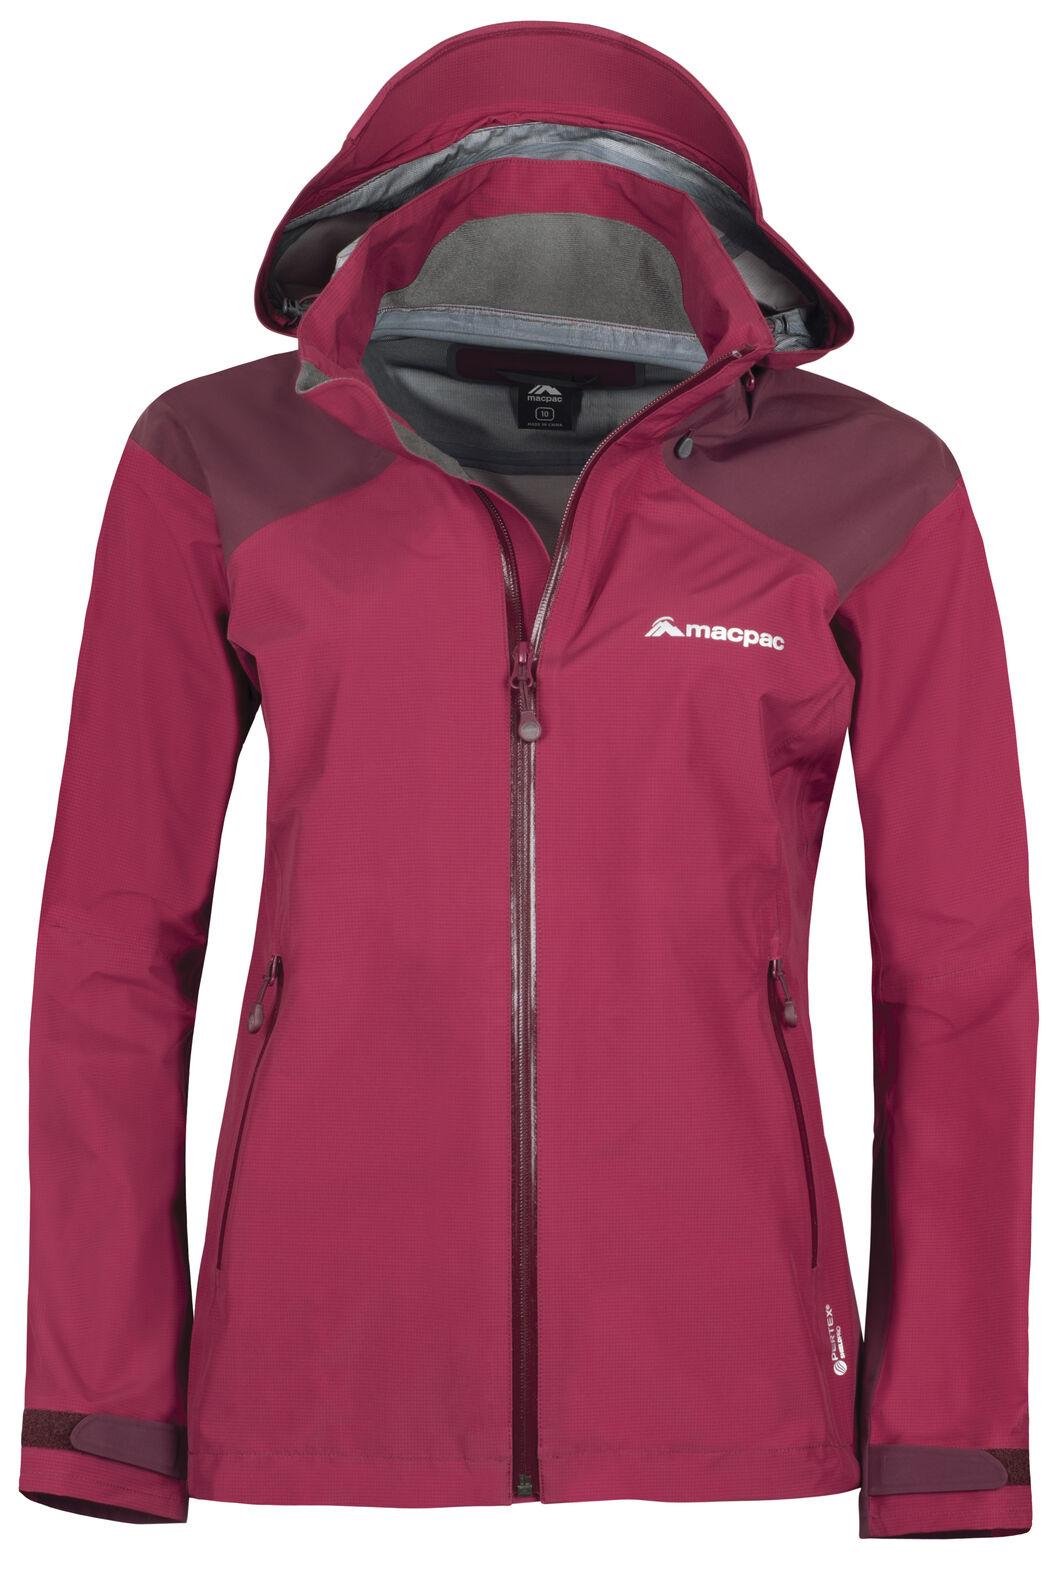 Macpac Traverse Pertex Shield® Rain Jacket - Women's, Rumba Red/Windsor Wine, hi-res